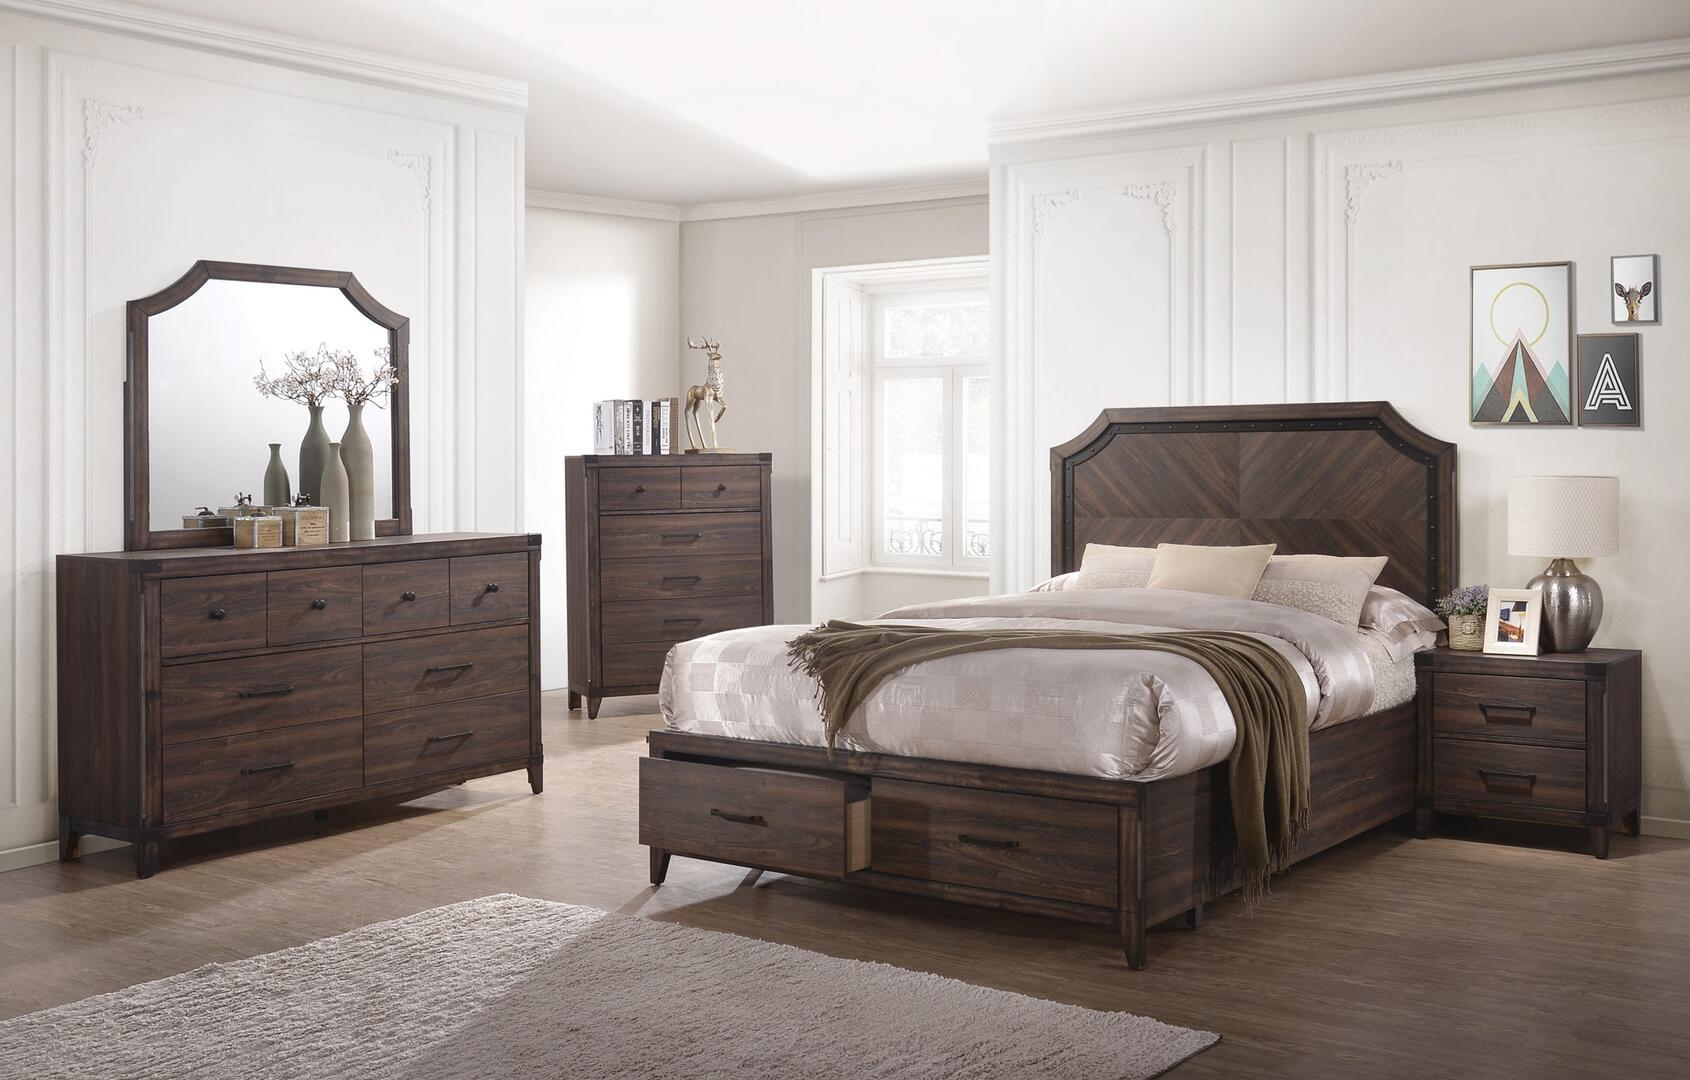 Coaster 205710QS5 Richmond Queen Bedroom Sets | Appliances Connection